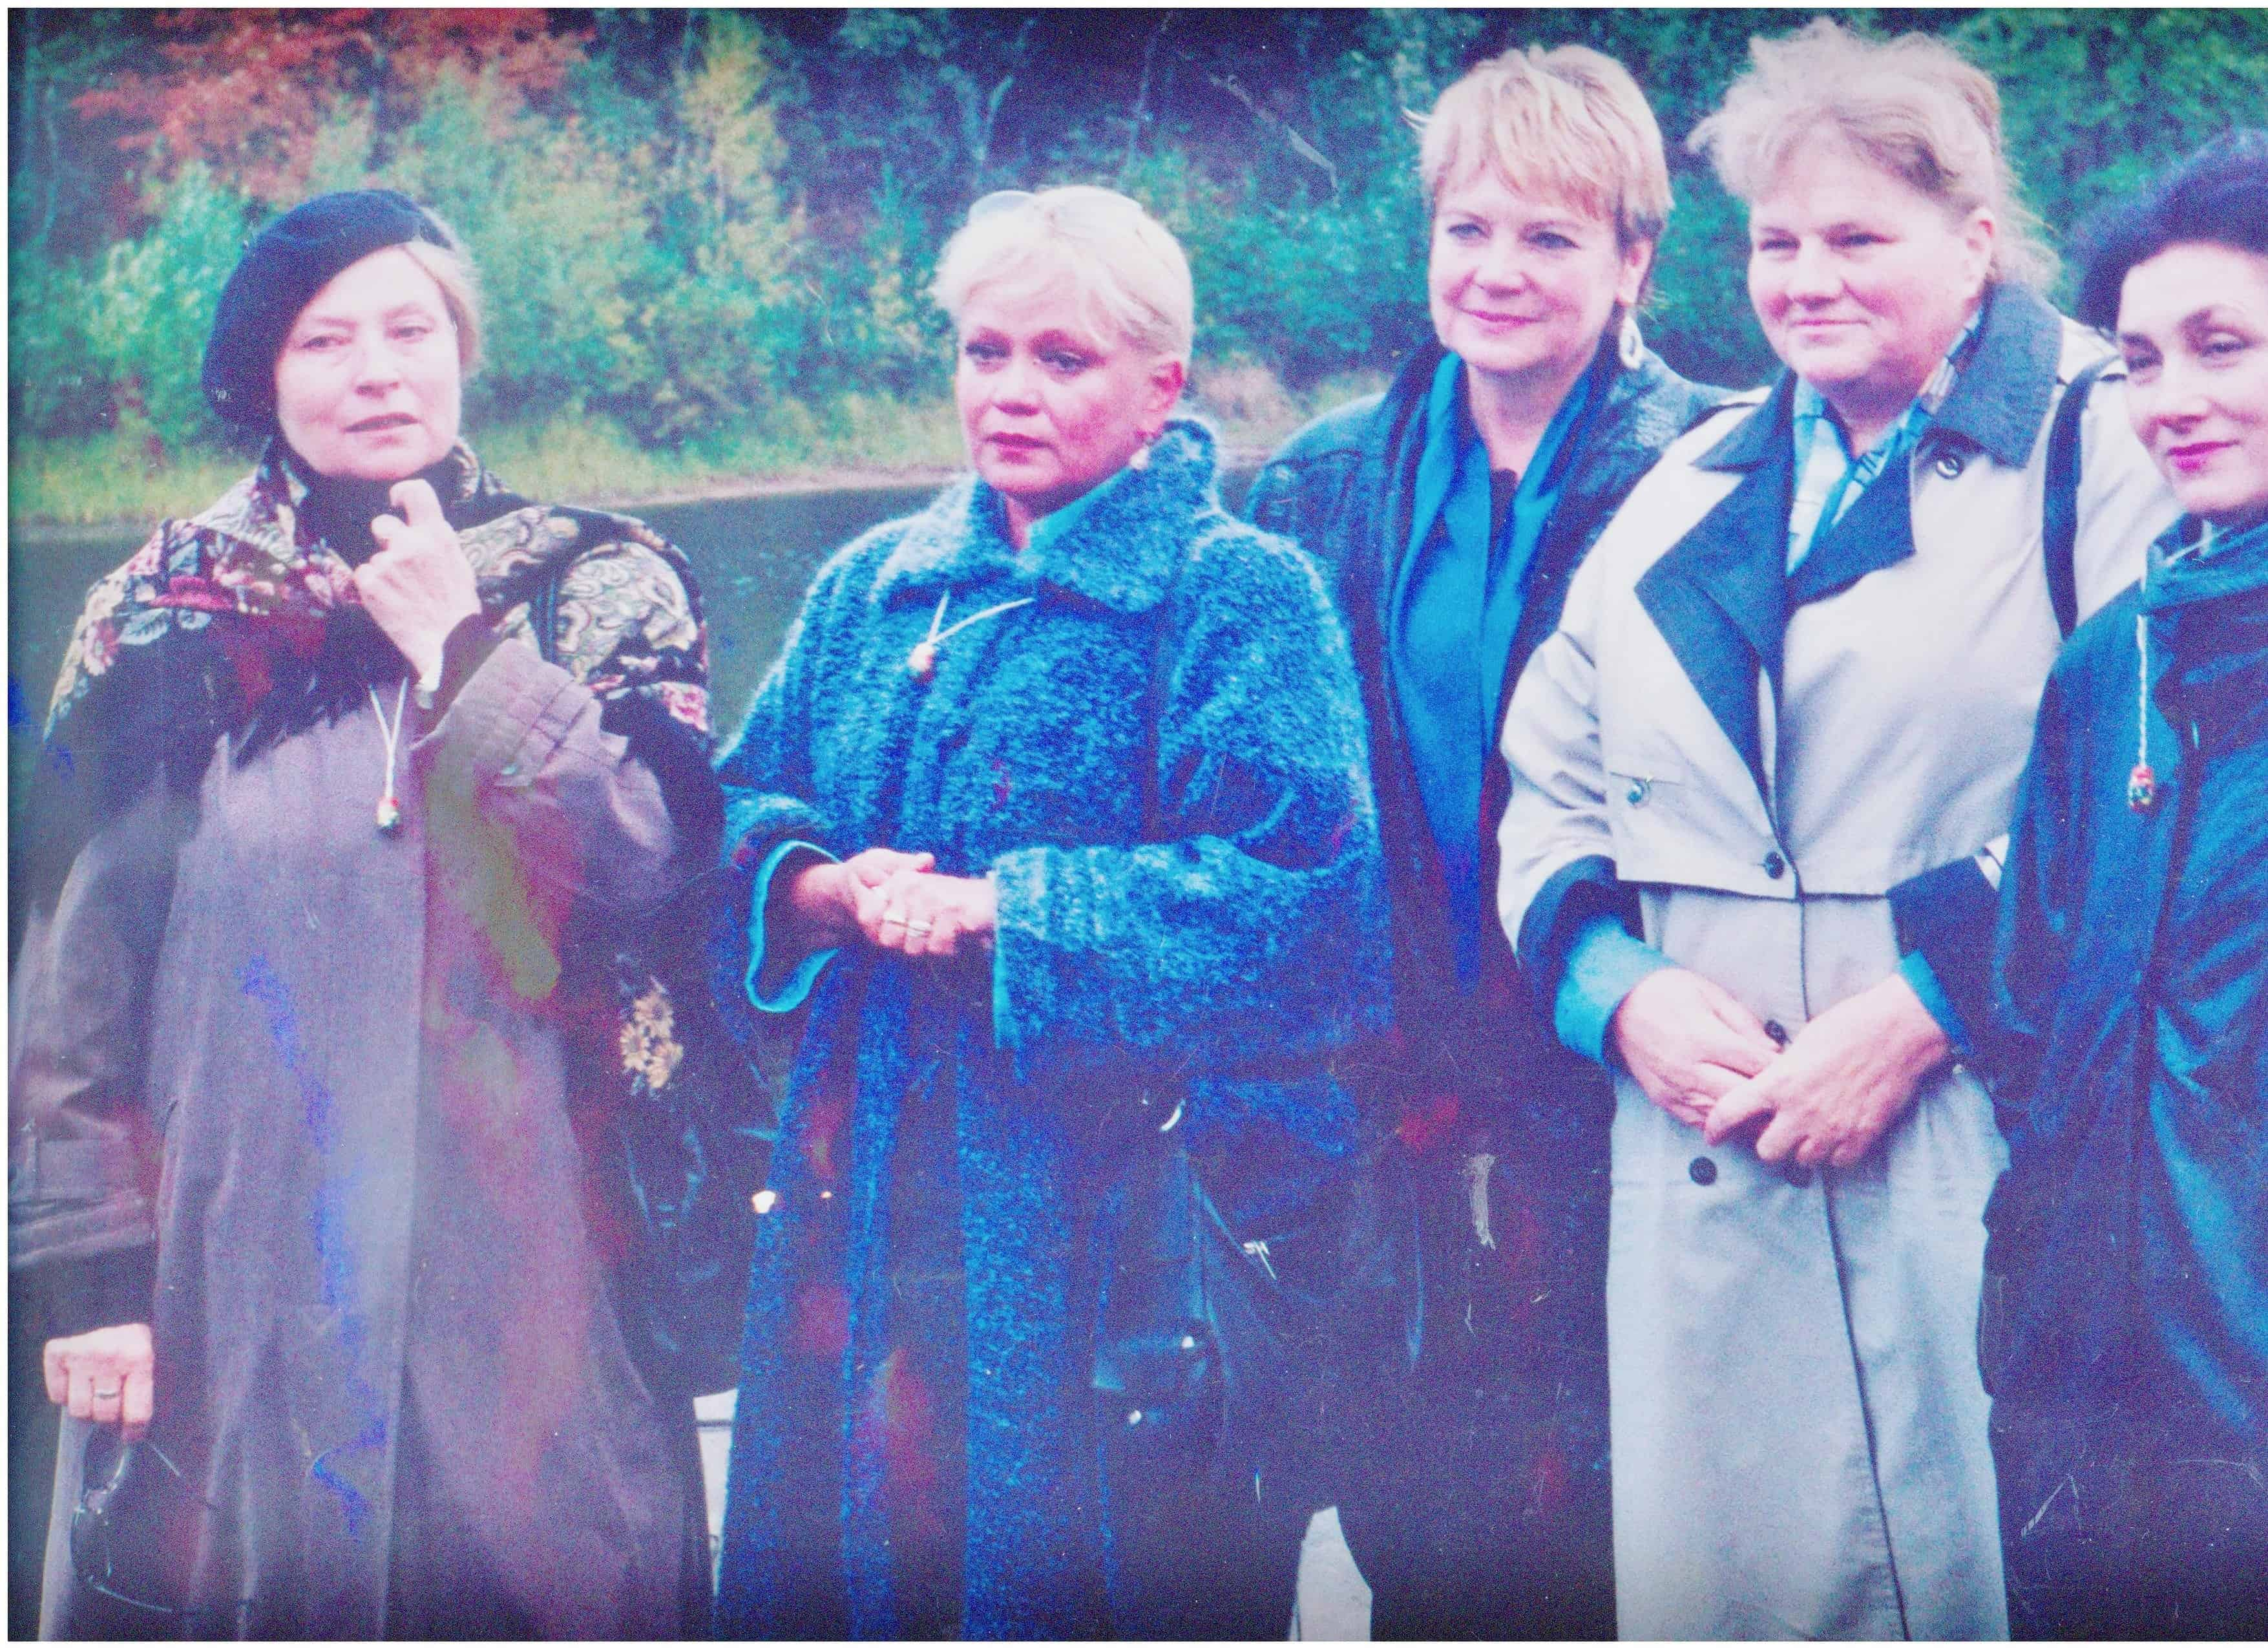 Слева направо:Людмила Зайцева,Ирина Шевчук,Светлана Борисова,Ирина Долганова.В Сяргилахте.Почти на том месте ,откуда нас,раненых увезли.